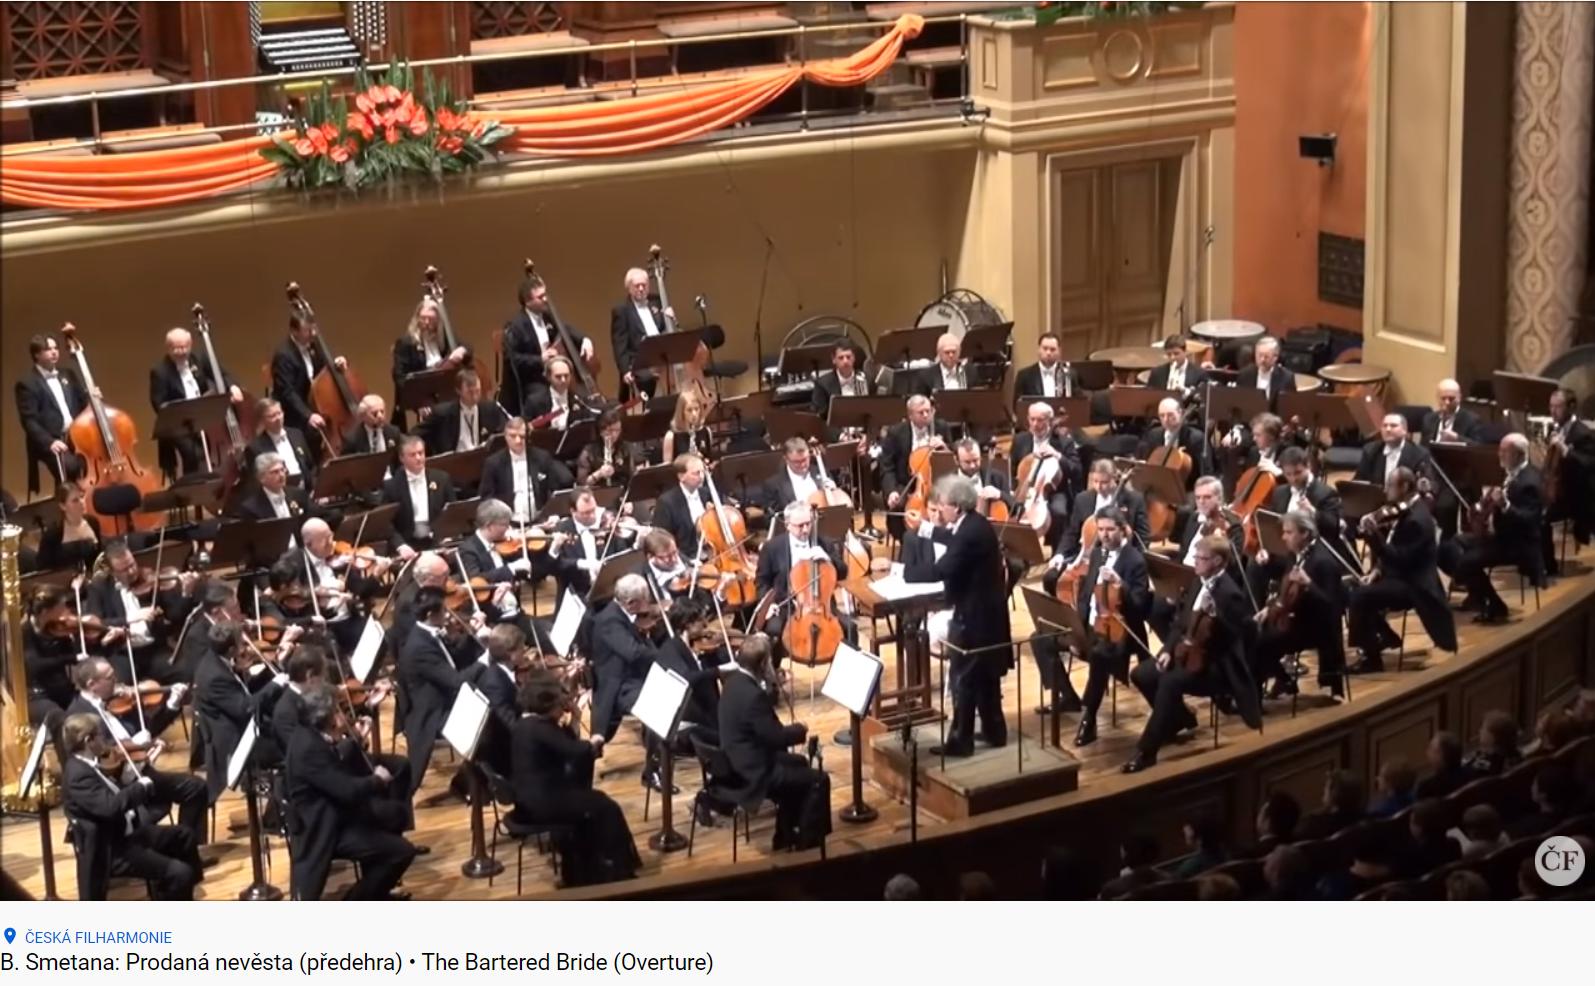 Smetana la fiancée vendue (Prodana nevesta) ouverture